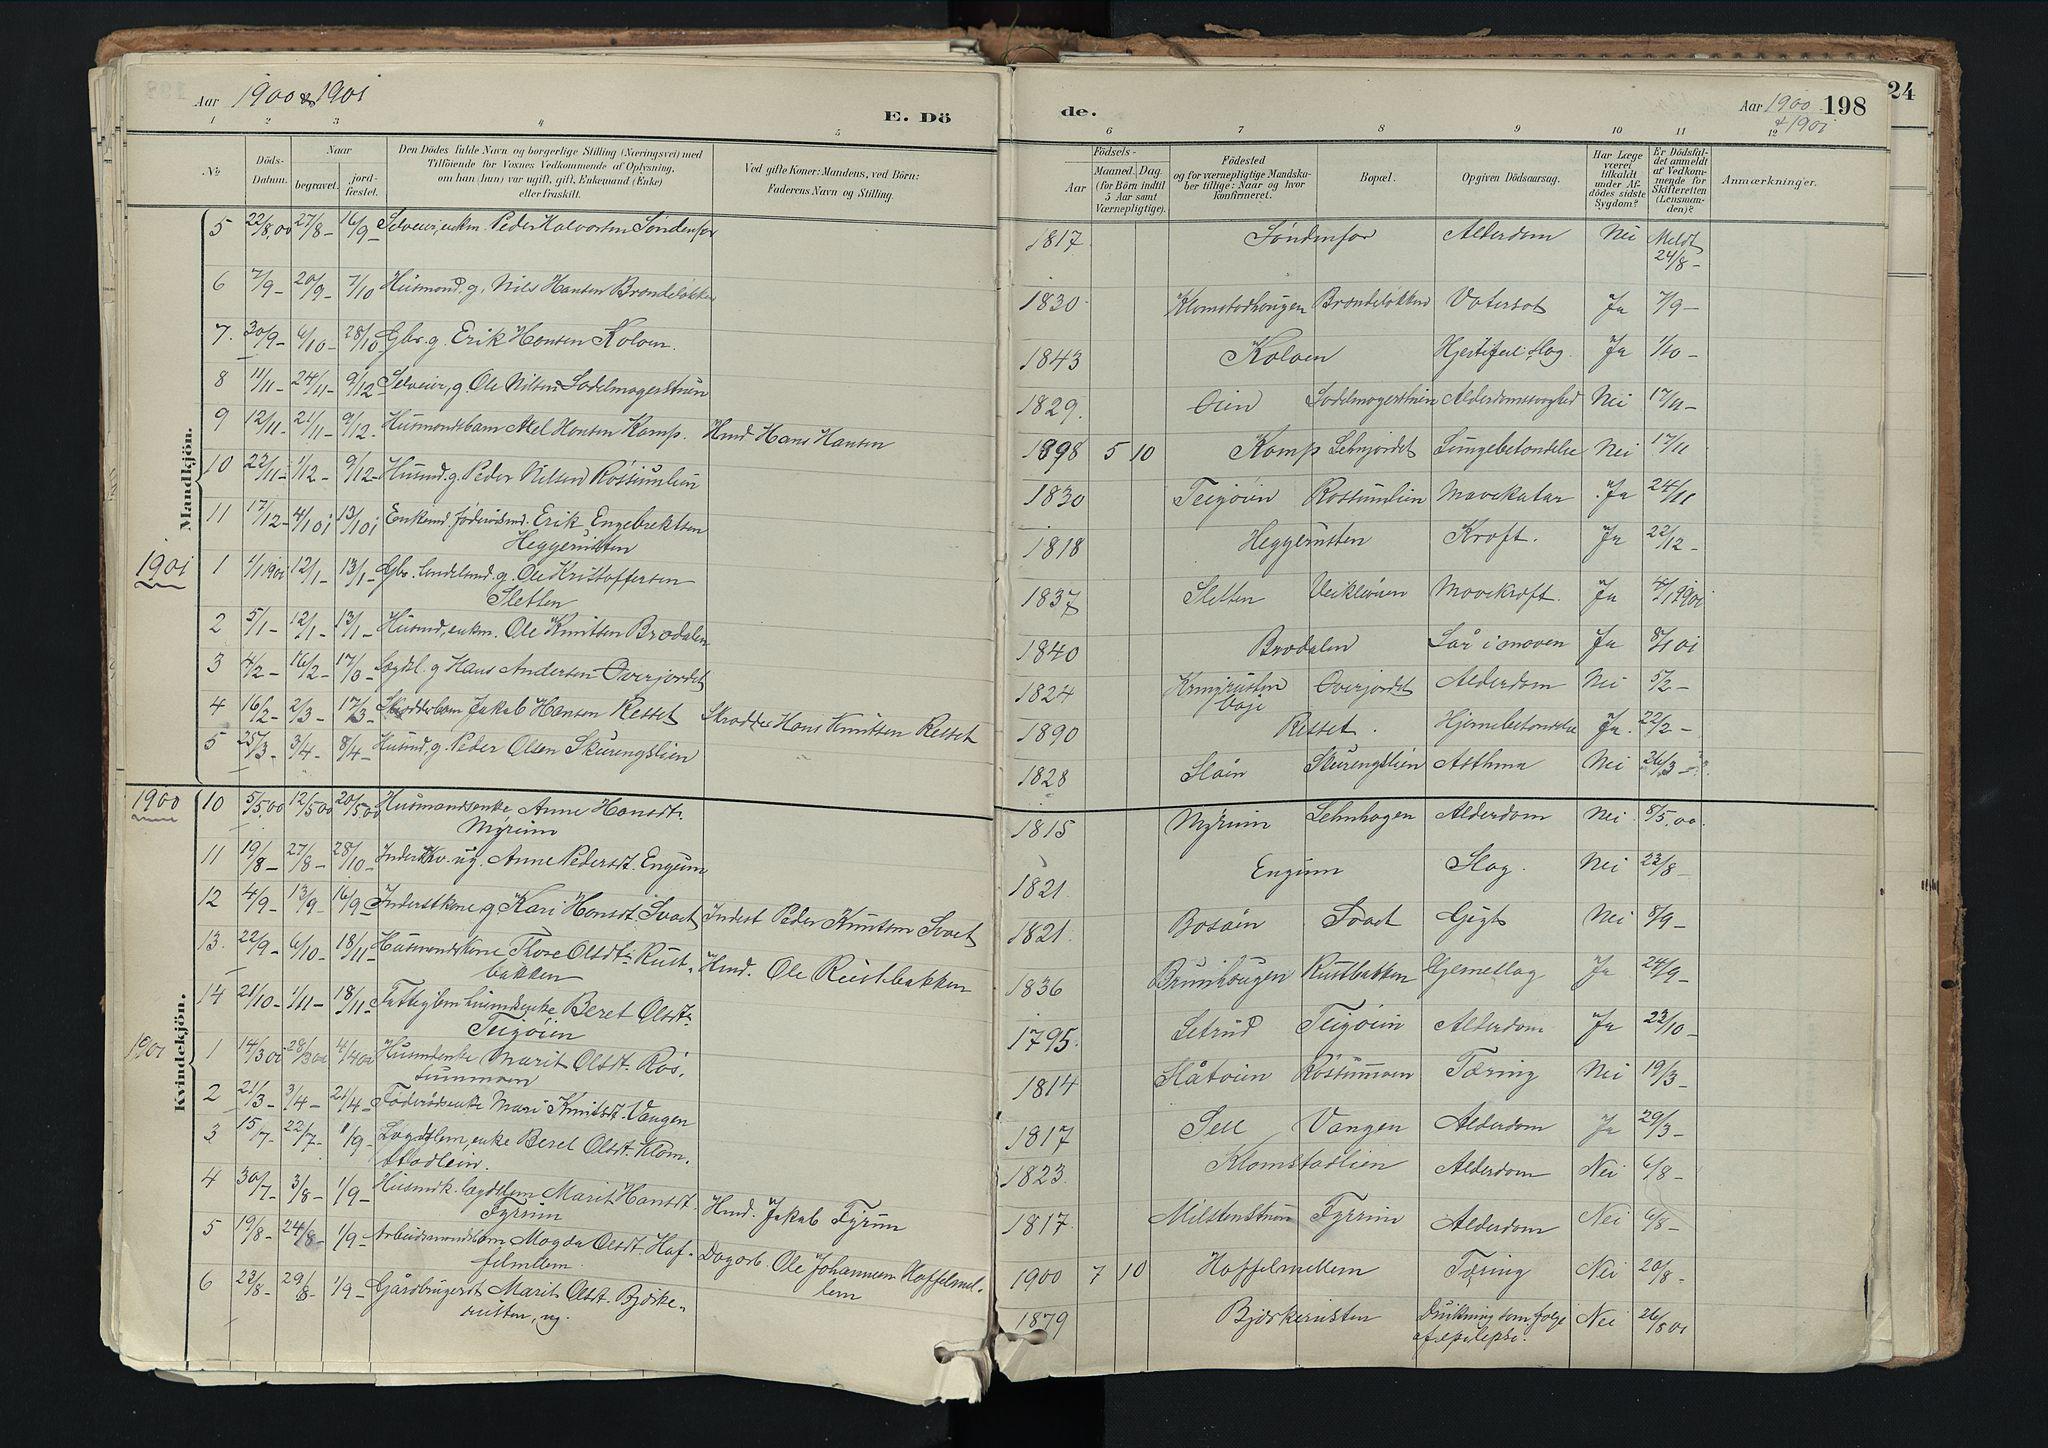 SAH, Nord-Fron prestekontor, Ministerialbok nr. 3, 1884-1914, s. 198